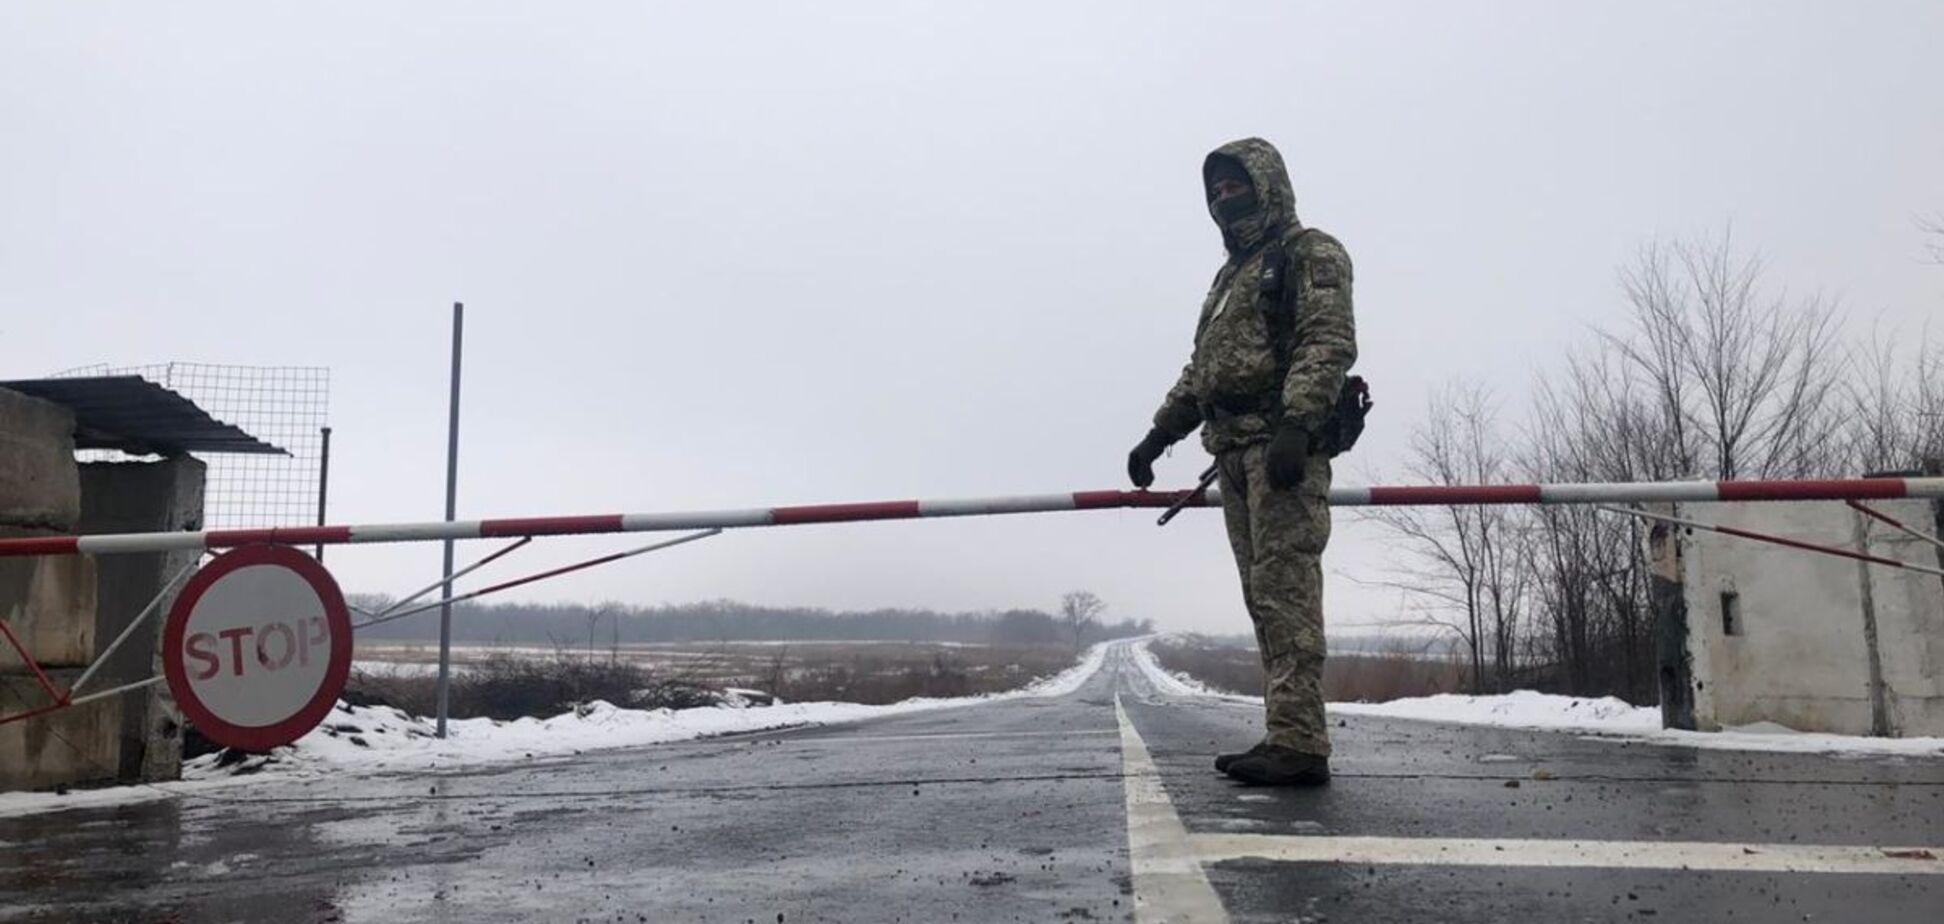 Забастовки в ОРДЛО: стоят на коленях и поют хвалу Путину